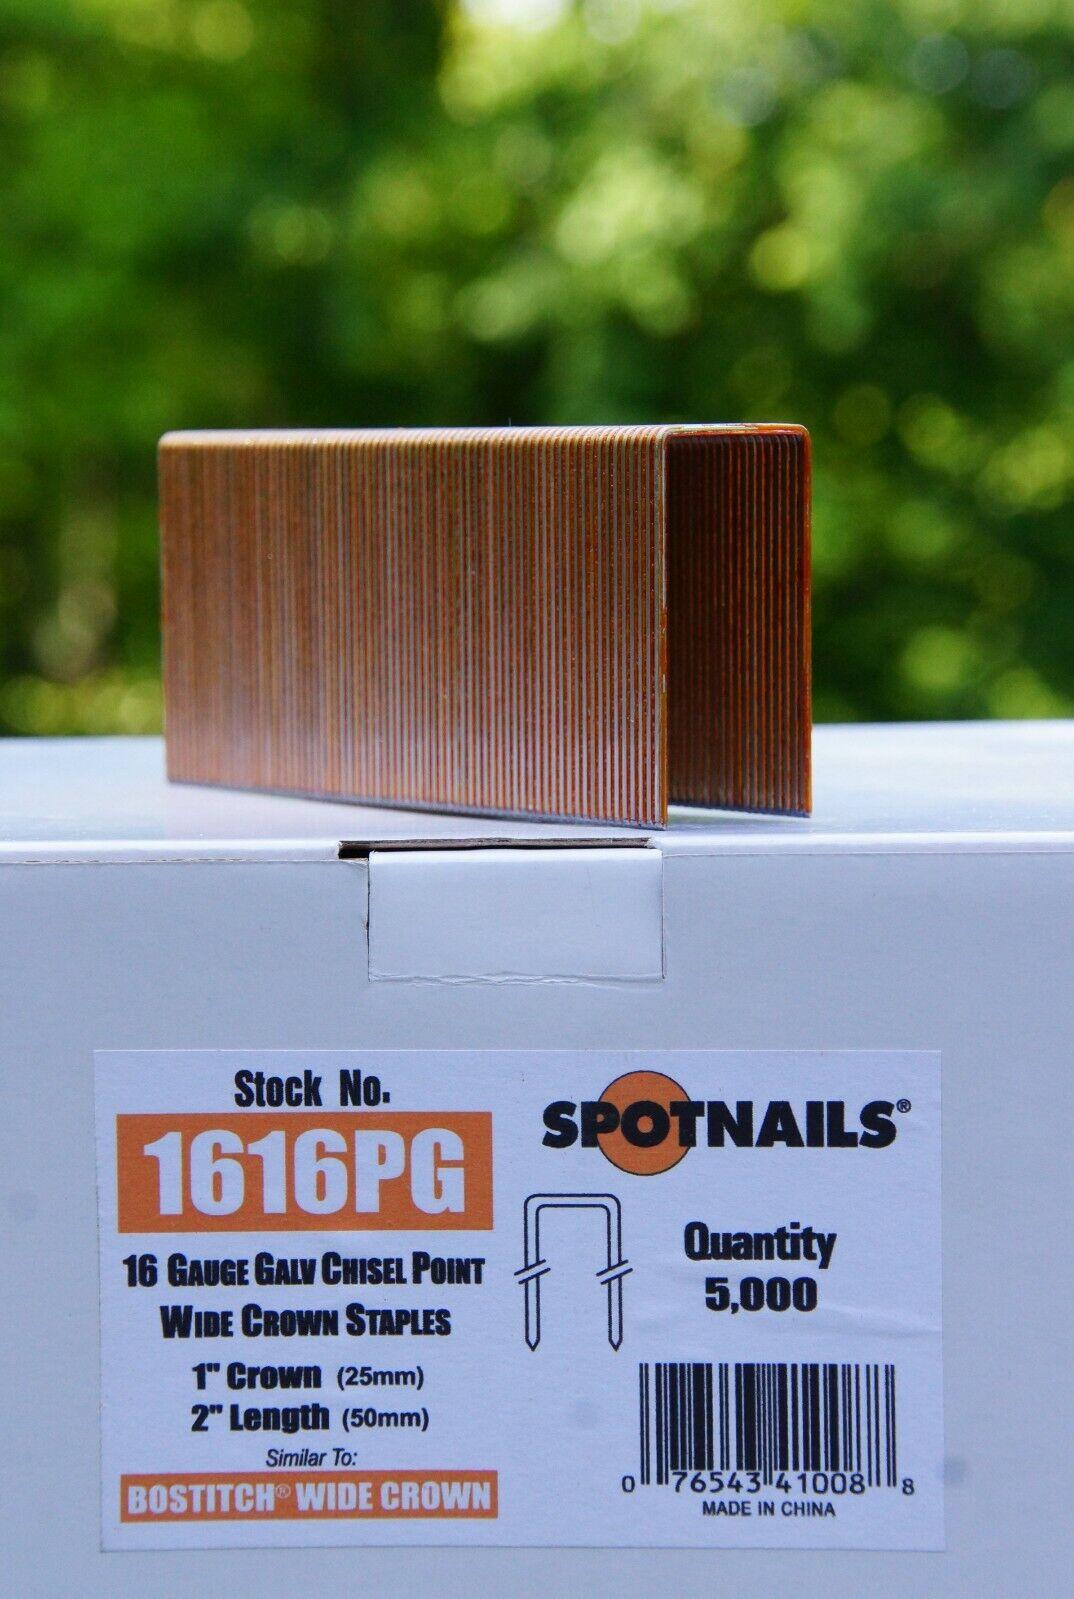 SPOTNAILS Staples chisel Point 16 gauge Galvanized 5000pk 8612PG 1//2 crown 1-1//2